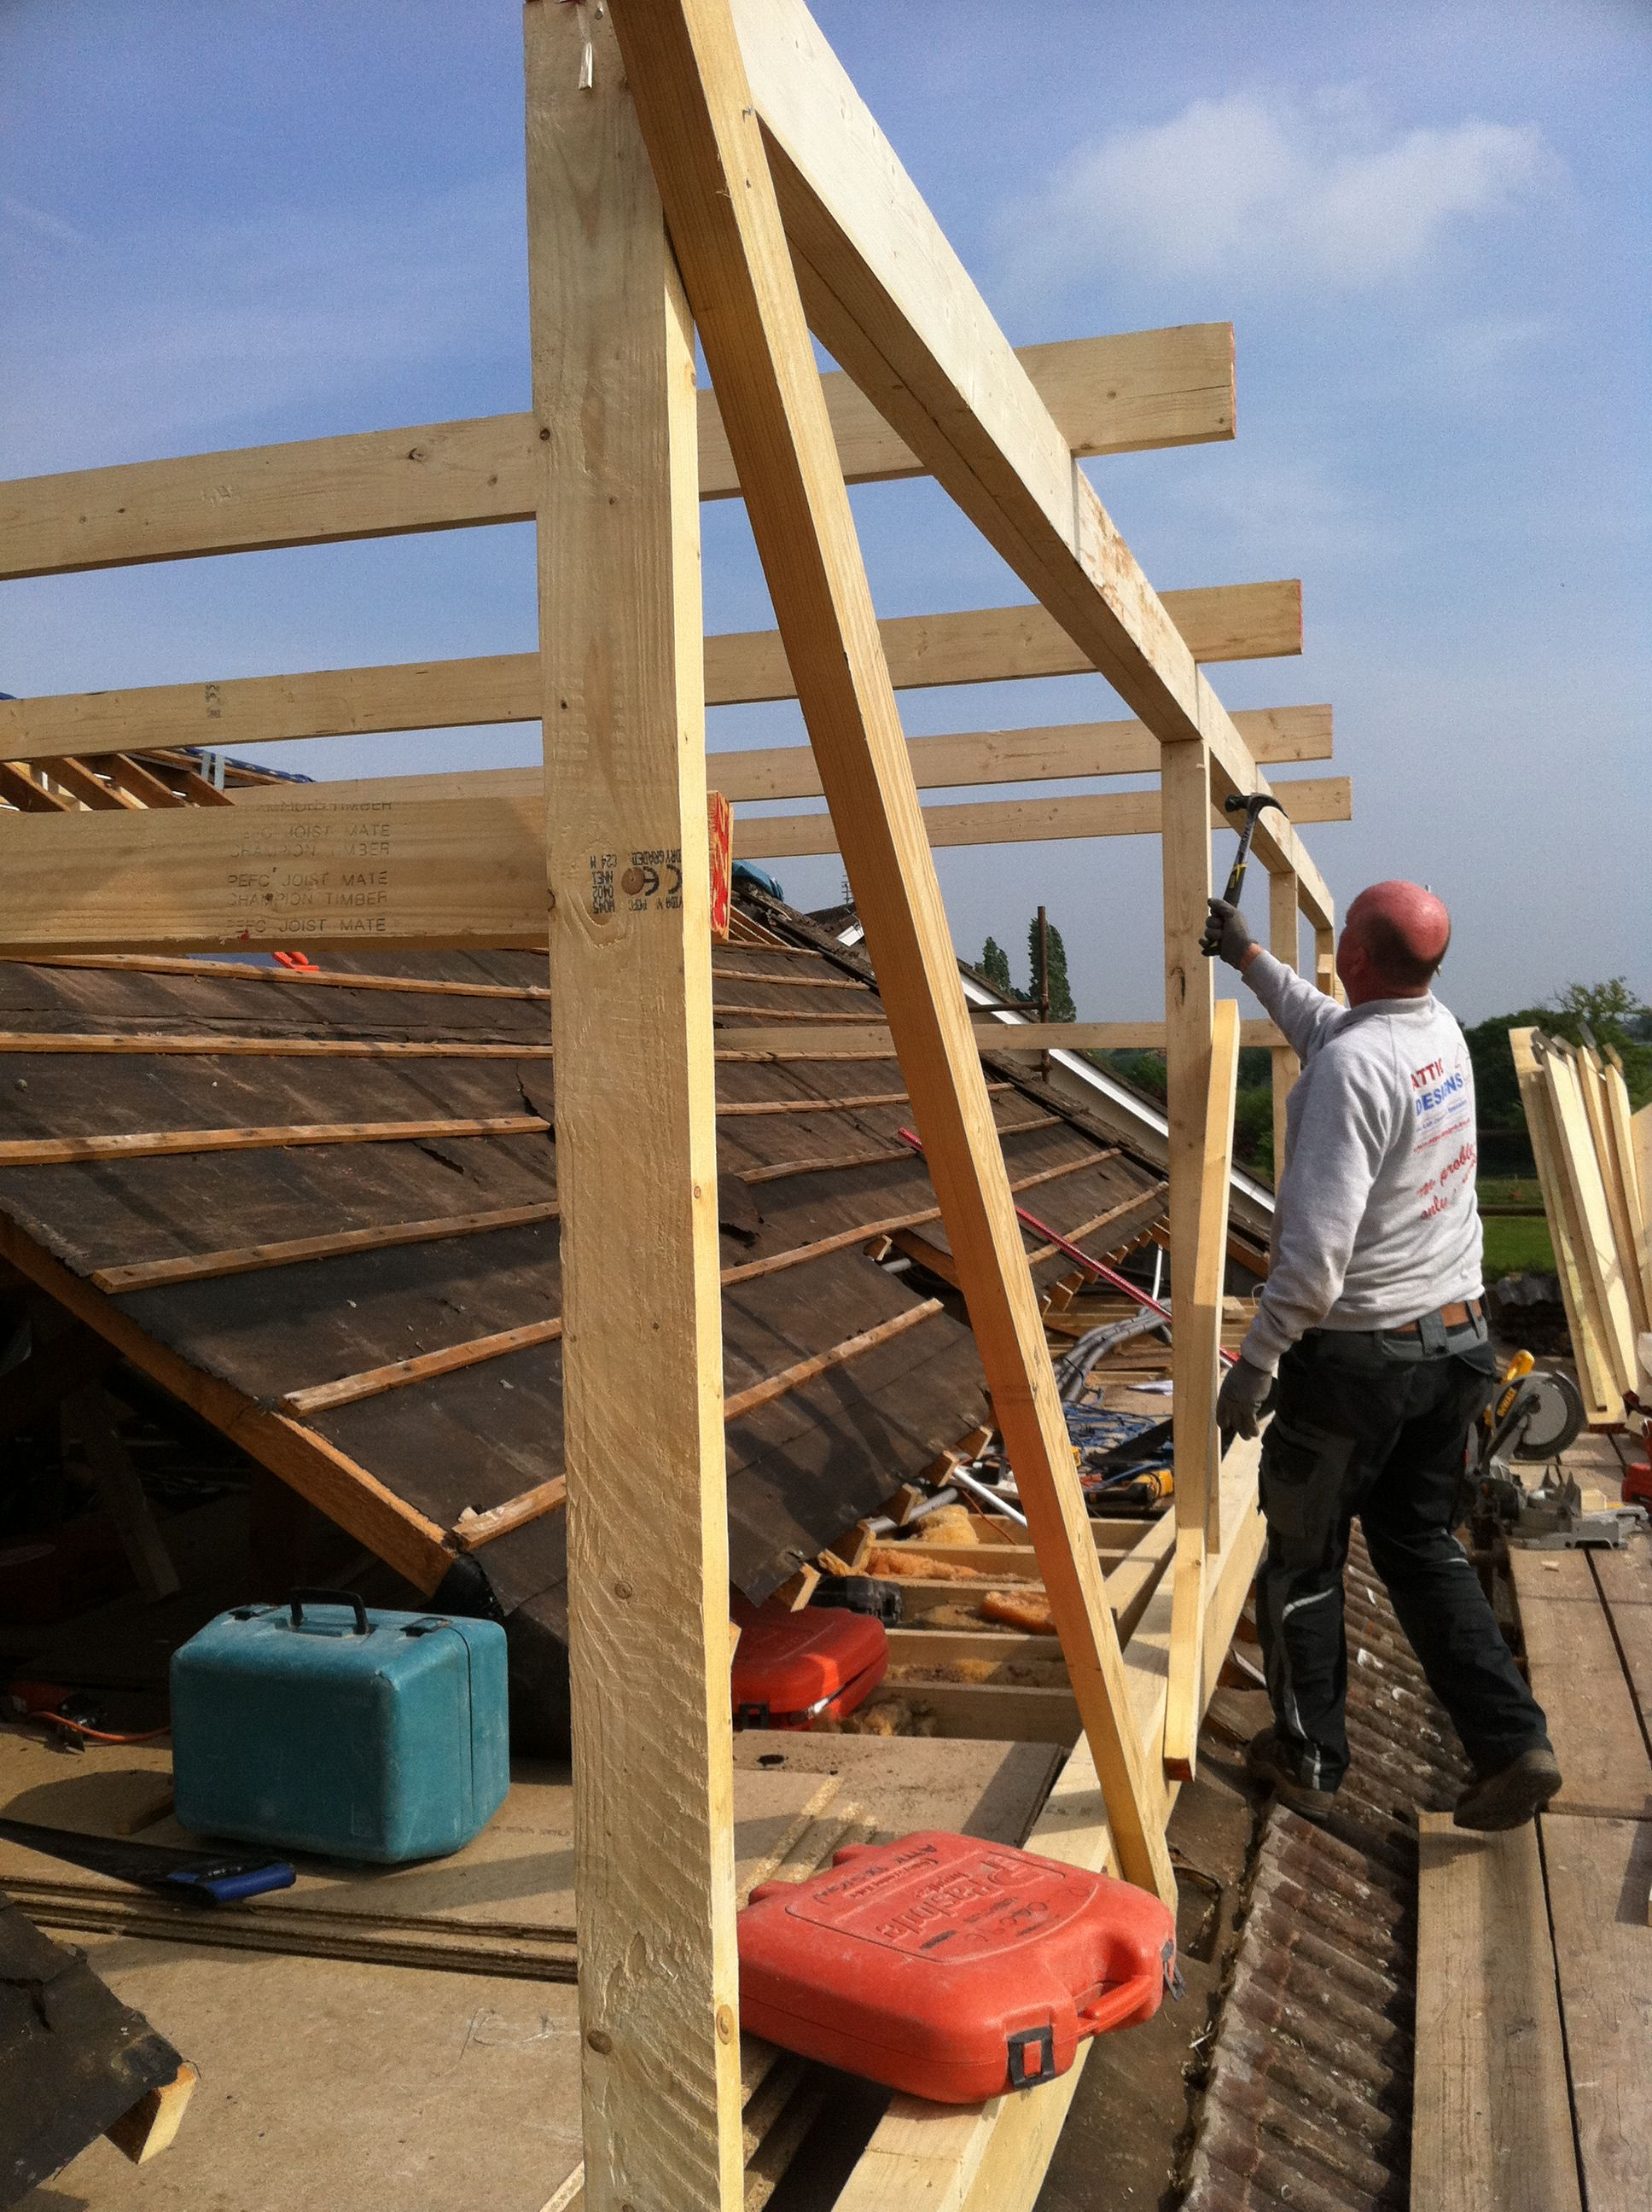 Loft Conversion Flat Roof Dormer In Build 2 Loft Conversion Flat Roof Roof Repair Diy Flat Roof Construction